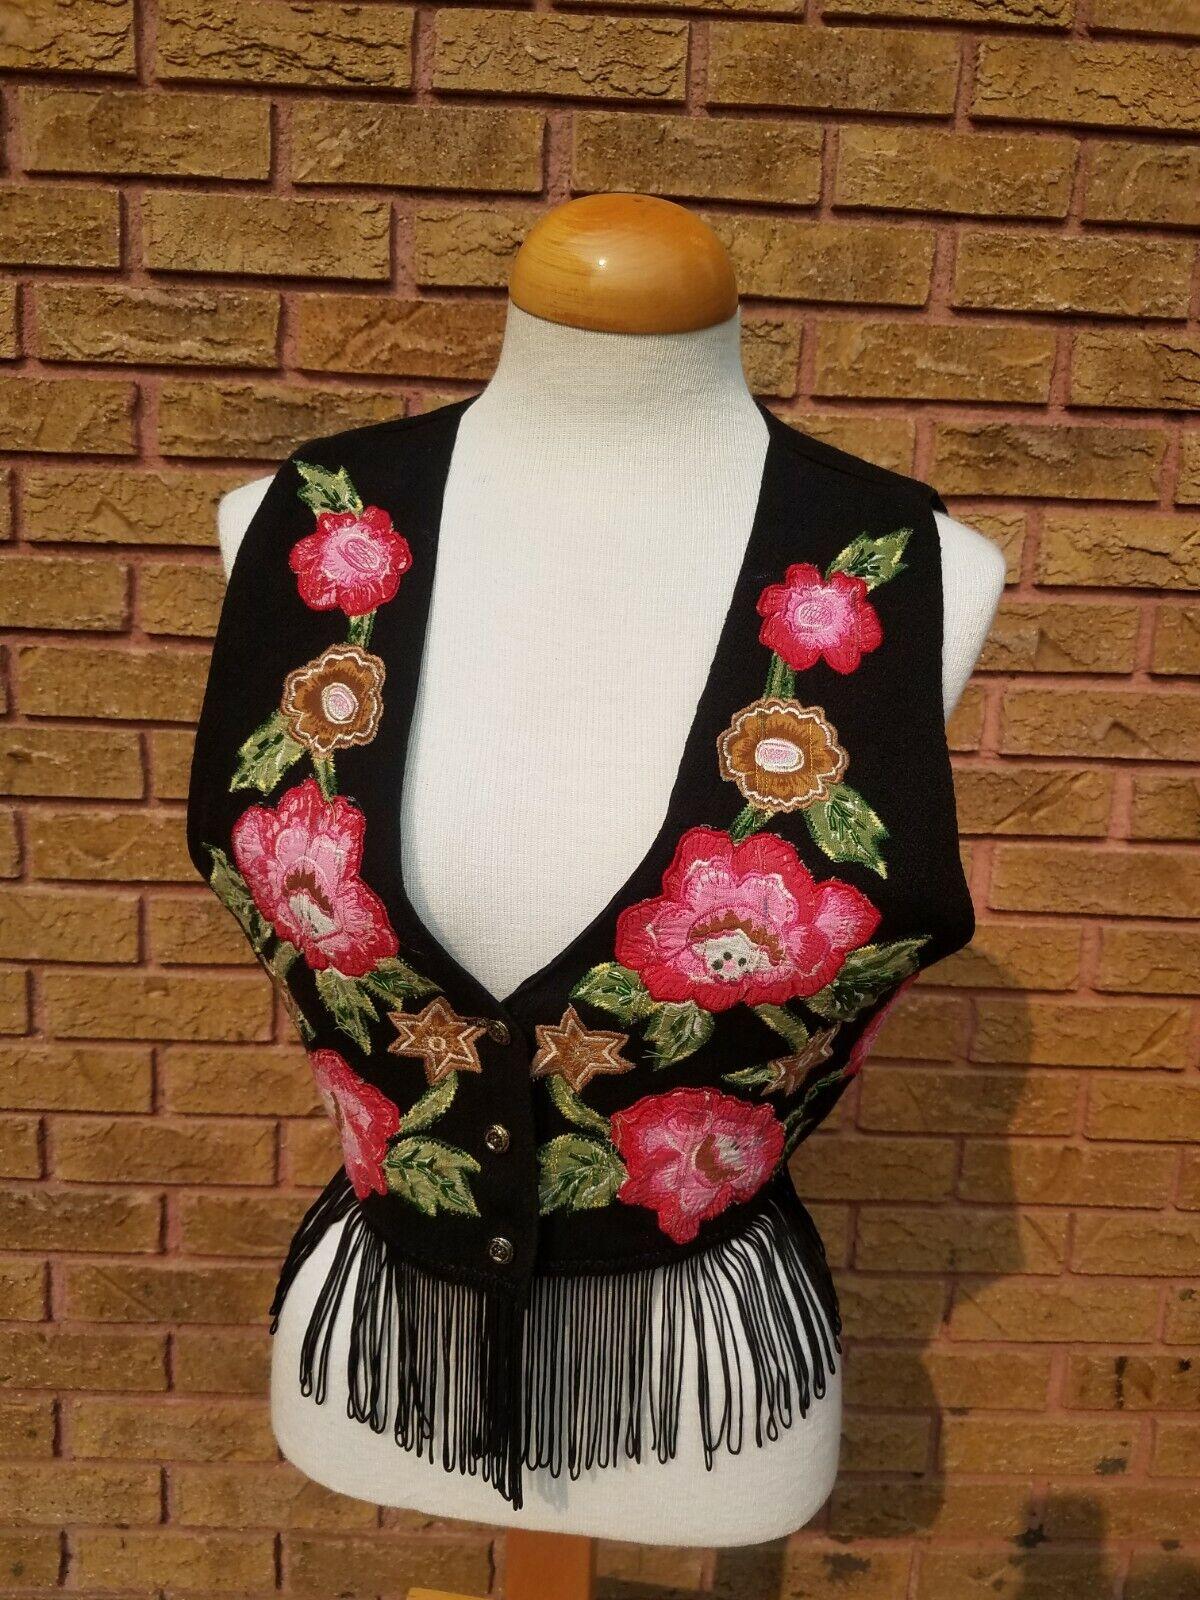 Fringed Vtg Embroidered Floral Vest Boho Hippie Festival Beaded JouJou M Lurex